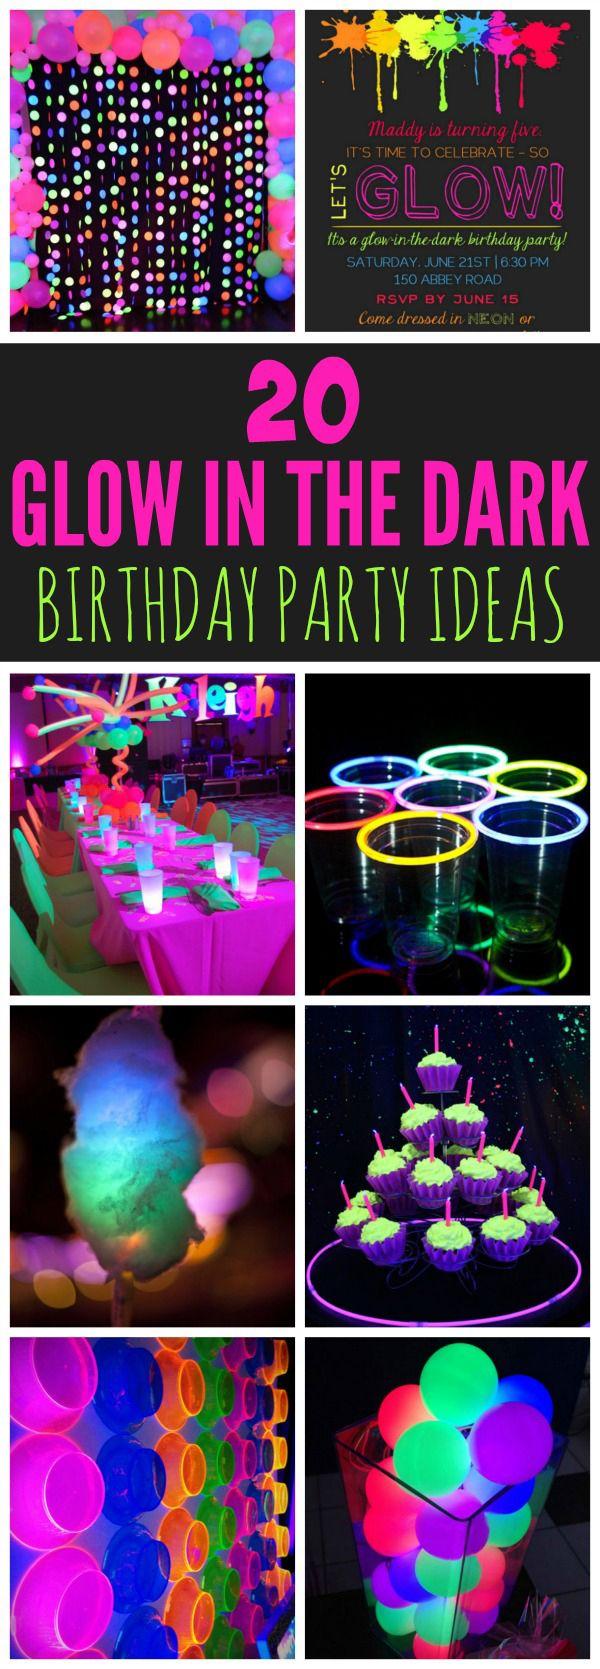 20 epic glow in the dark party ideas dark birthdays and. Black Bedroom Furniture Sets. Home Design Ideas